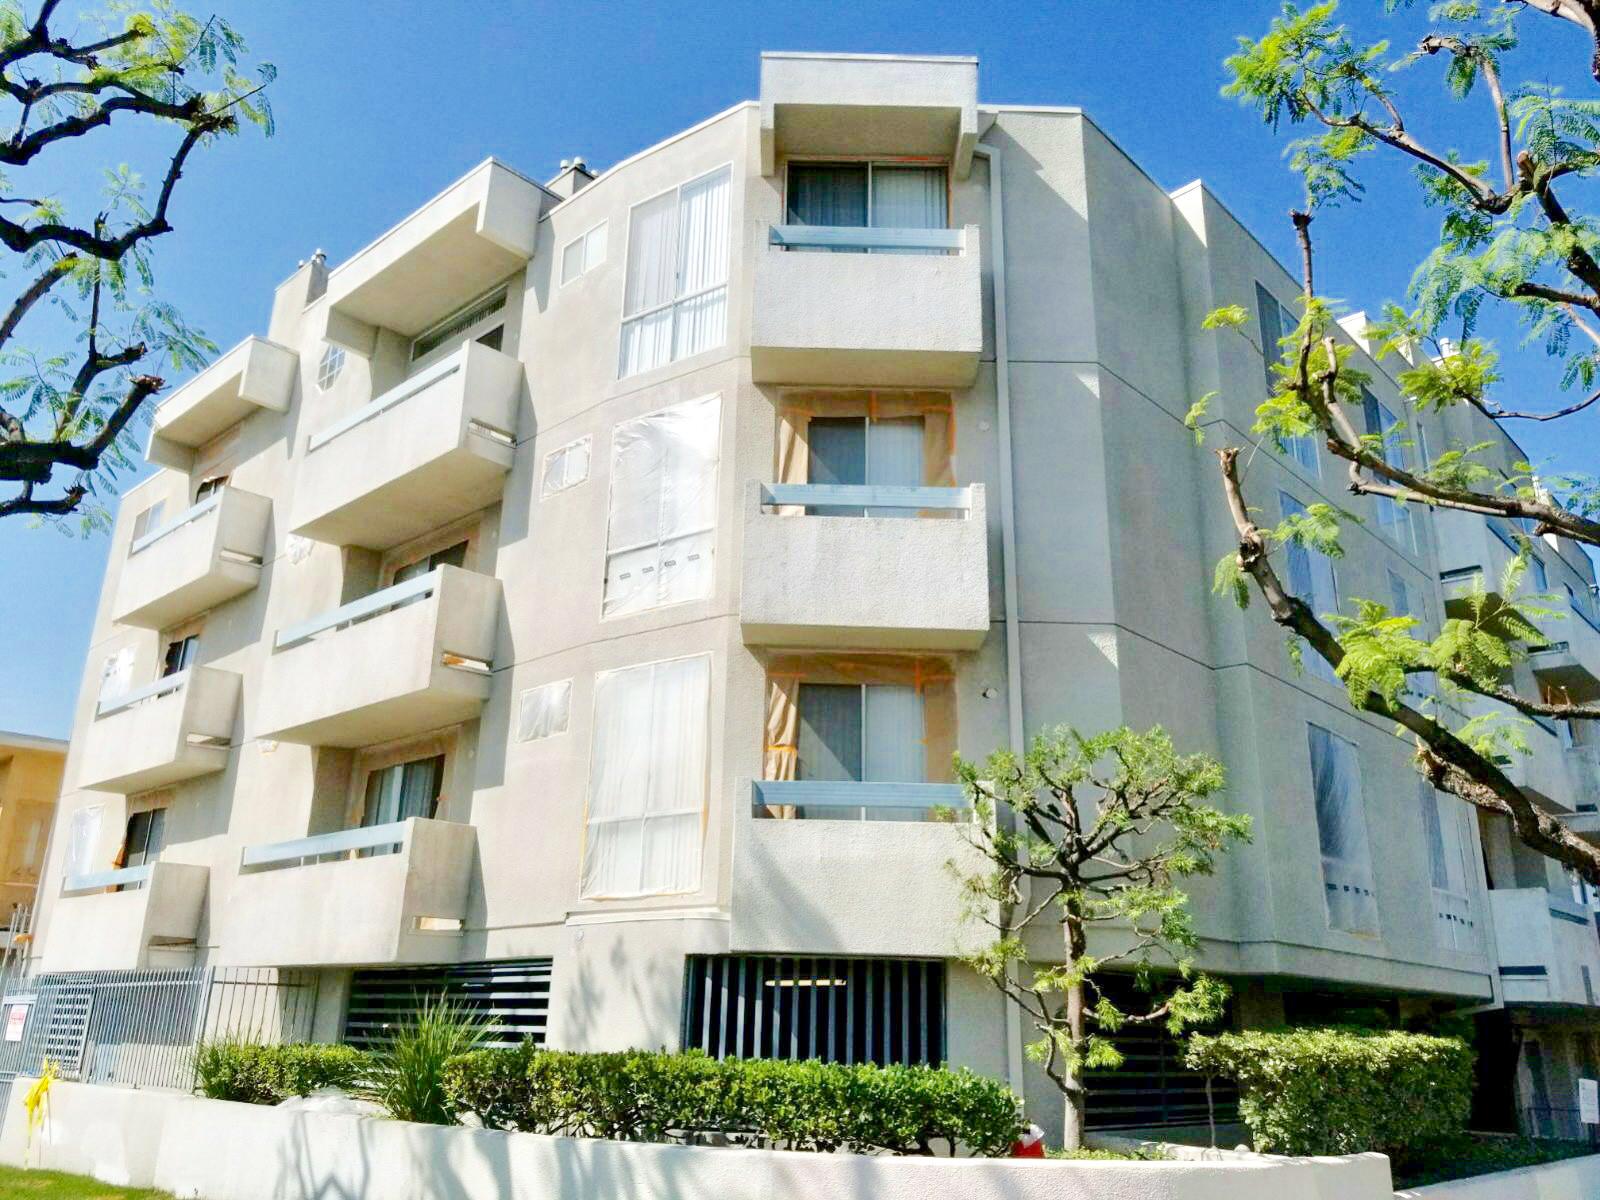 Apartment Complex- Los Angeles